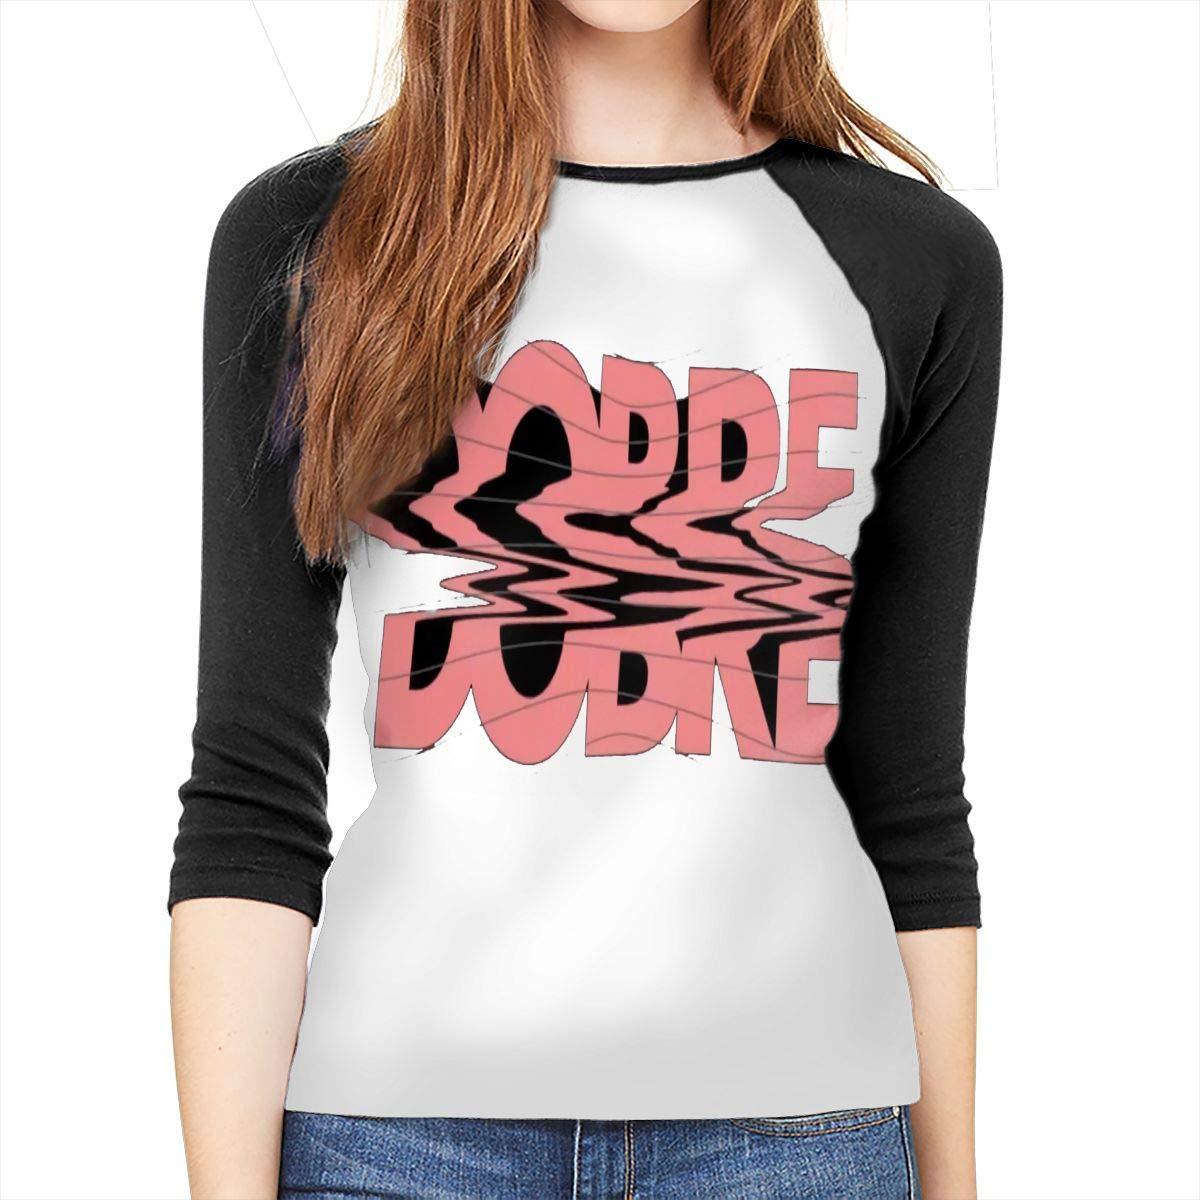 WangSiwe Dobre Brothers Music Band Womens Shirt 3//4 Sleeve Casual Scoop Neck Tops Tee S-XXL Black T-Shirt